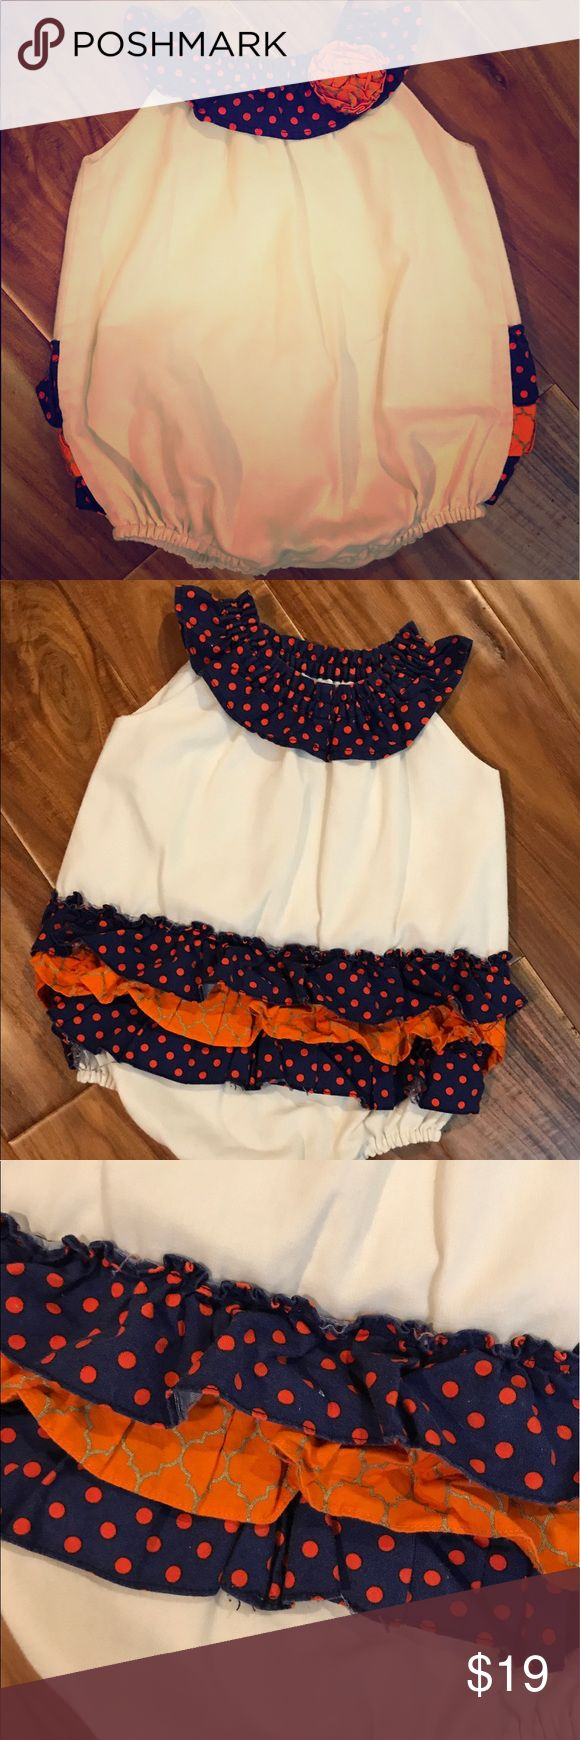 Orange and blue handmade onesie Great auburn game day attire.  Very well made. One Pieces Bodysuits